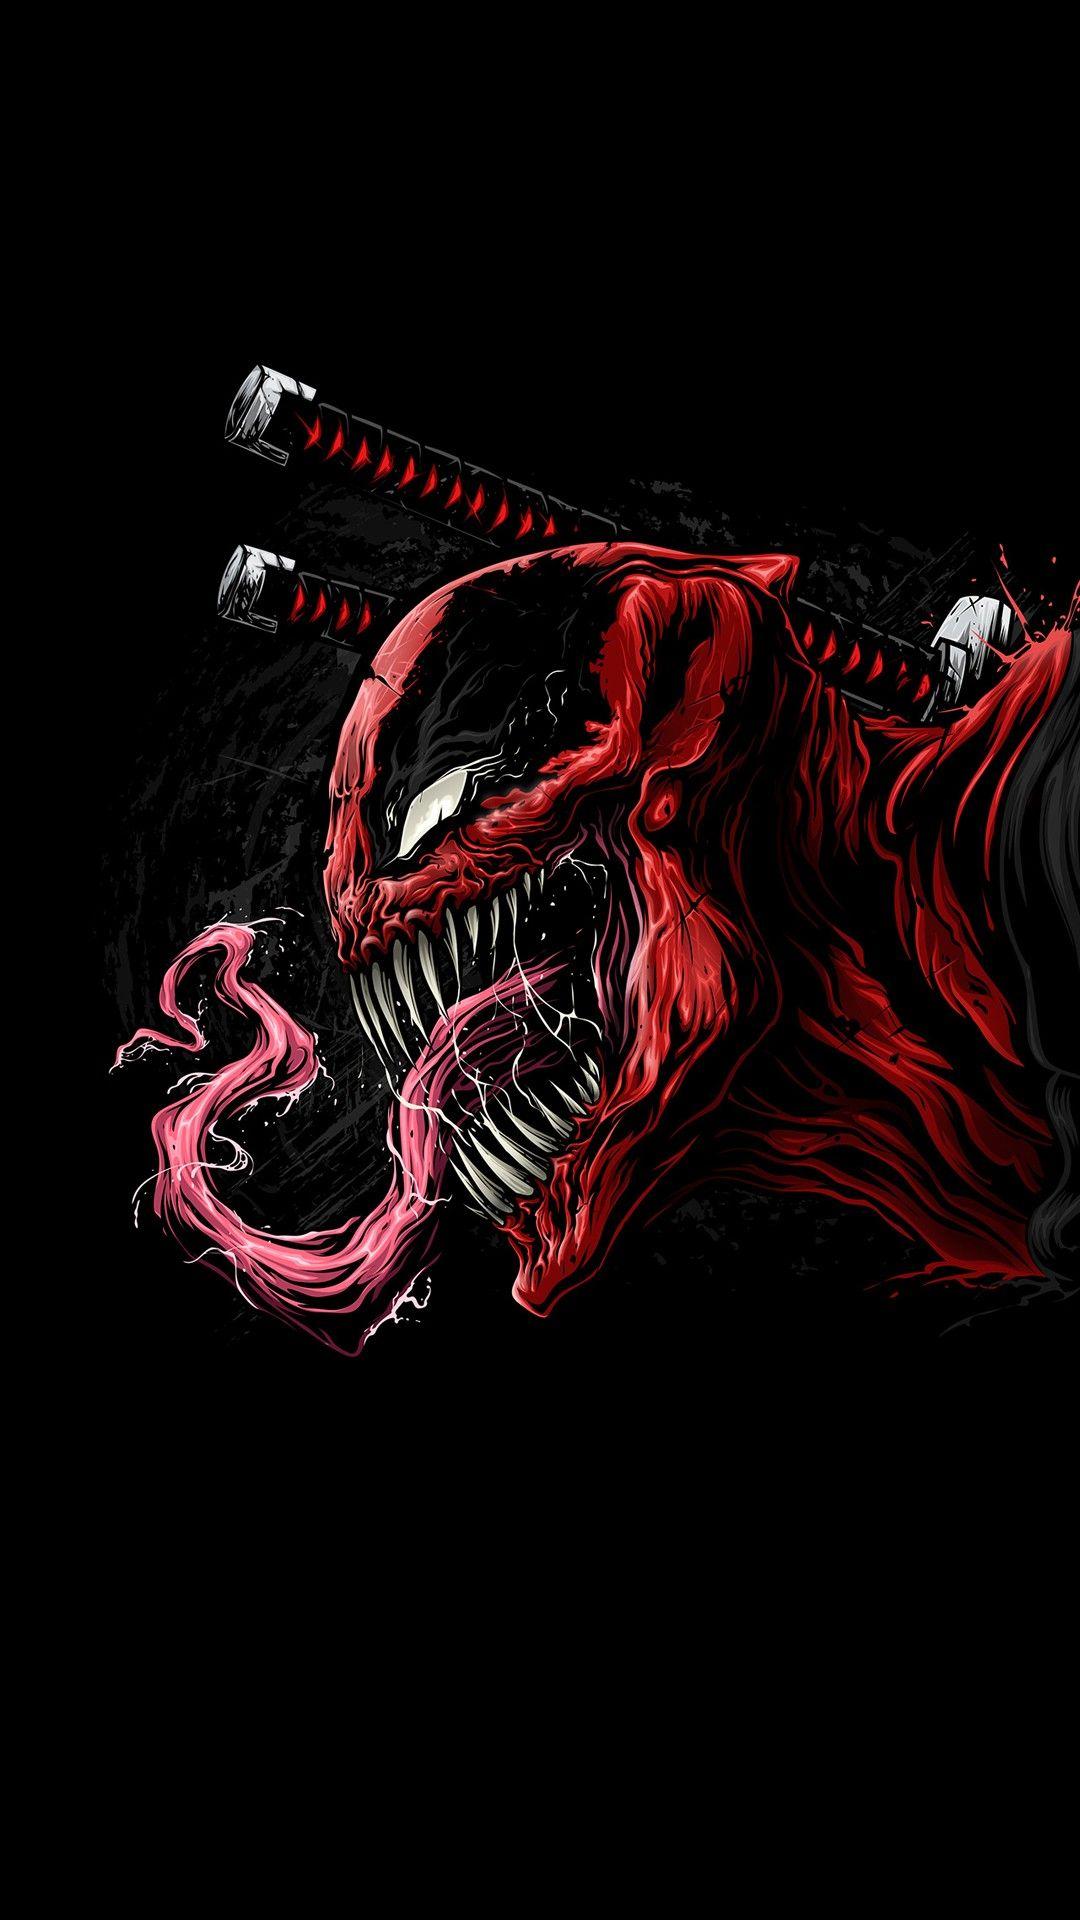 Venom deadpool fanmade wallpaper